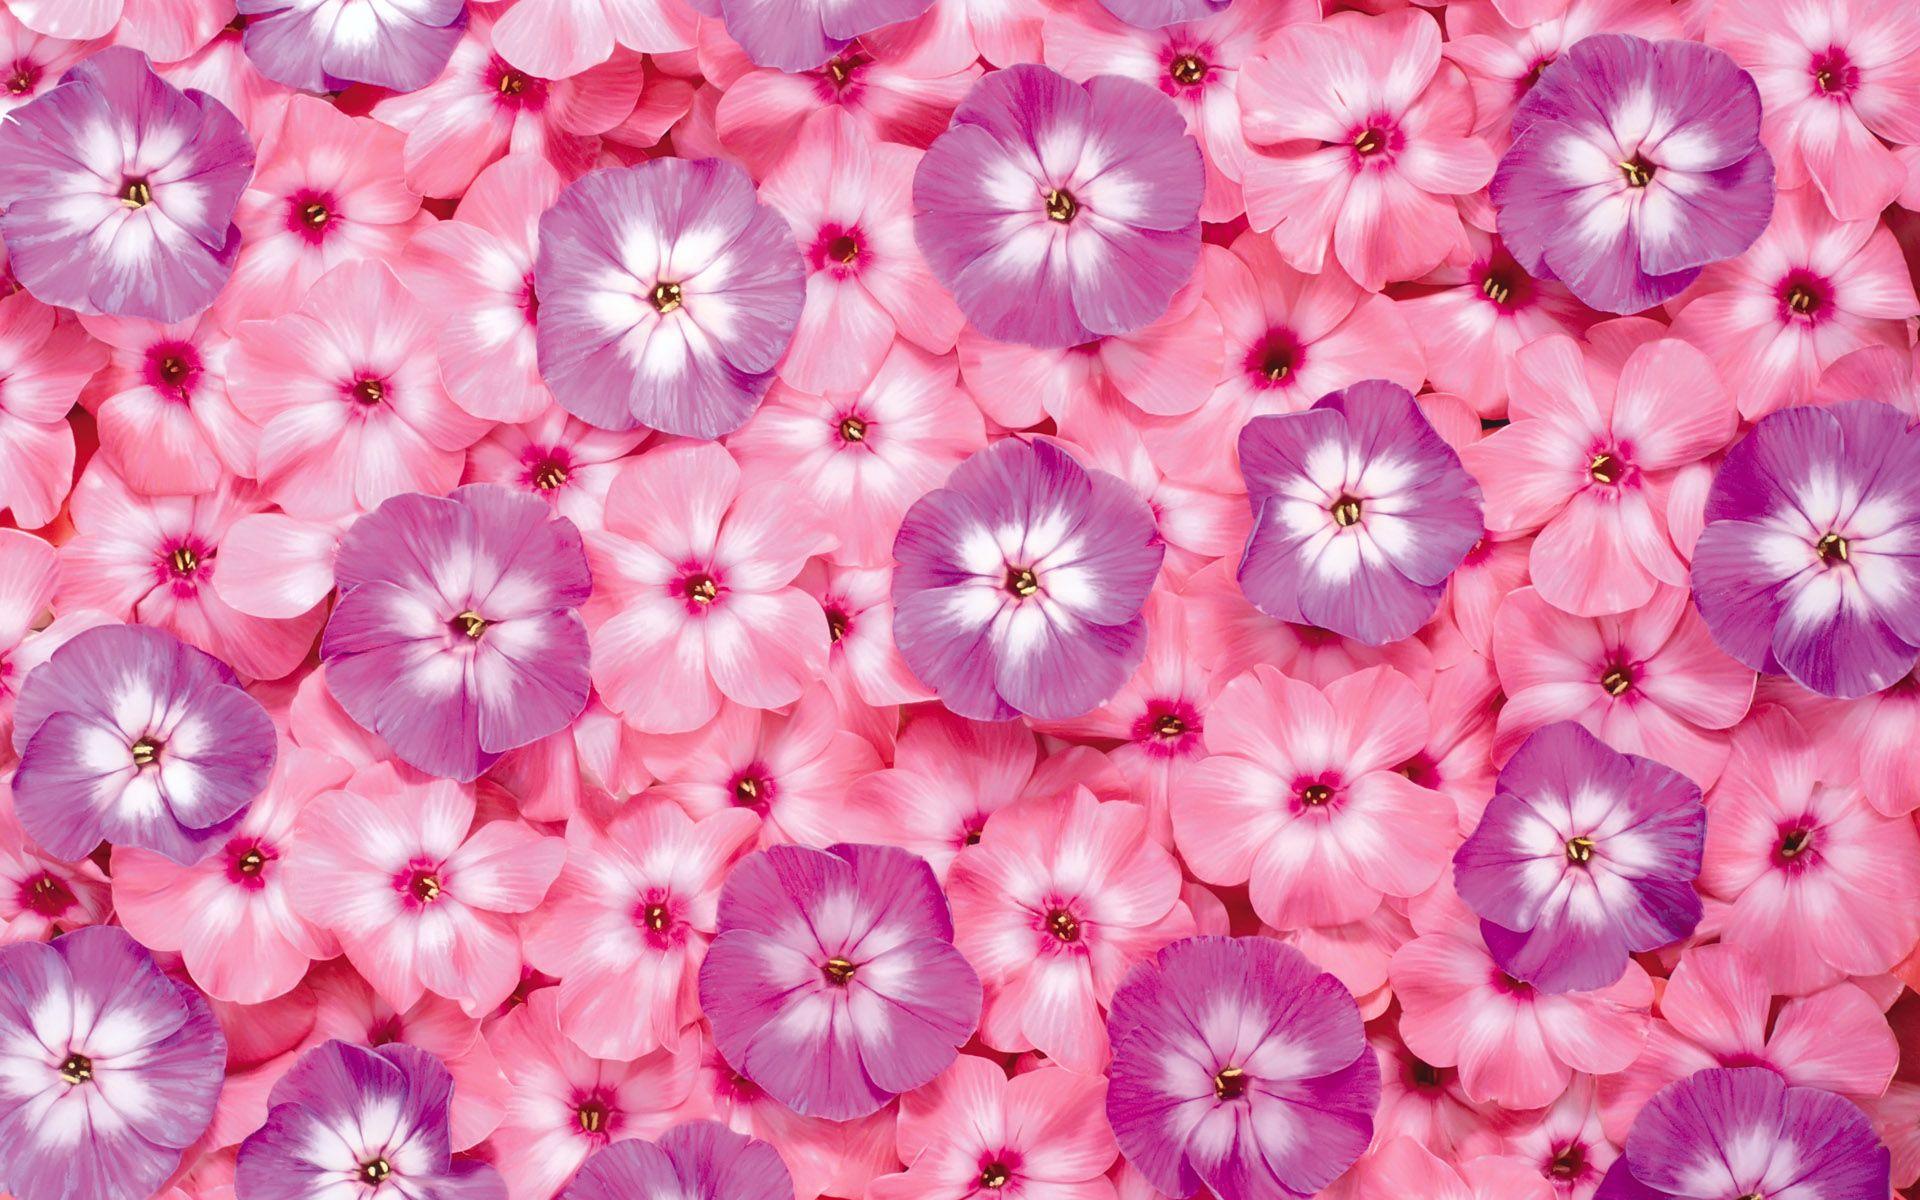 1920 The First Series Of Flowers Background 13647 Flower Desktop Wallpaper Purple Flowers Wallpaper Pink Flowers Wallpaper Coolest flower wallpapers hd